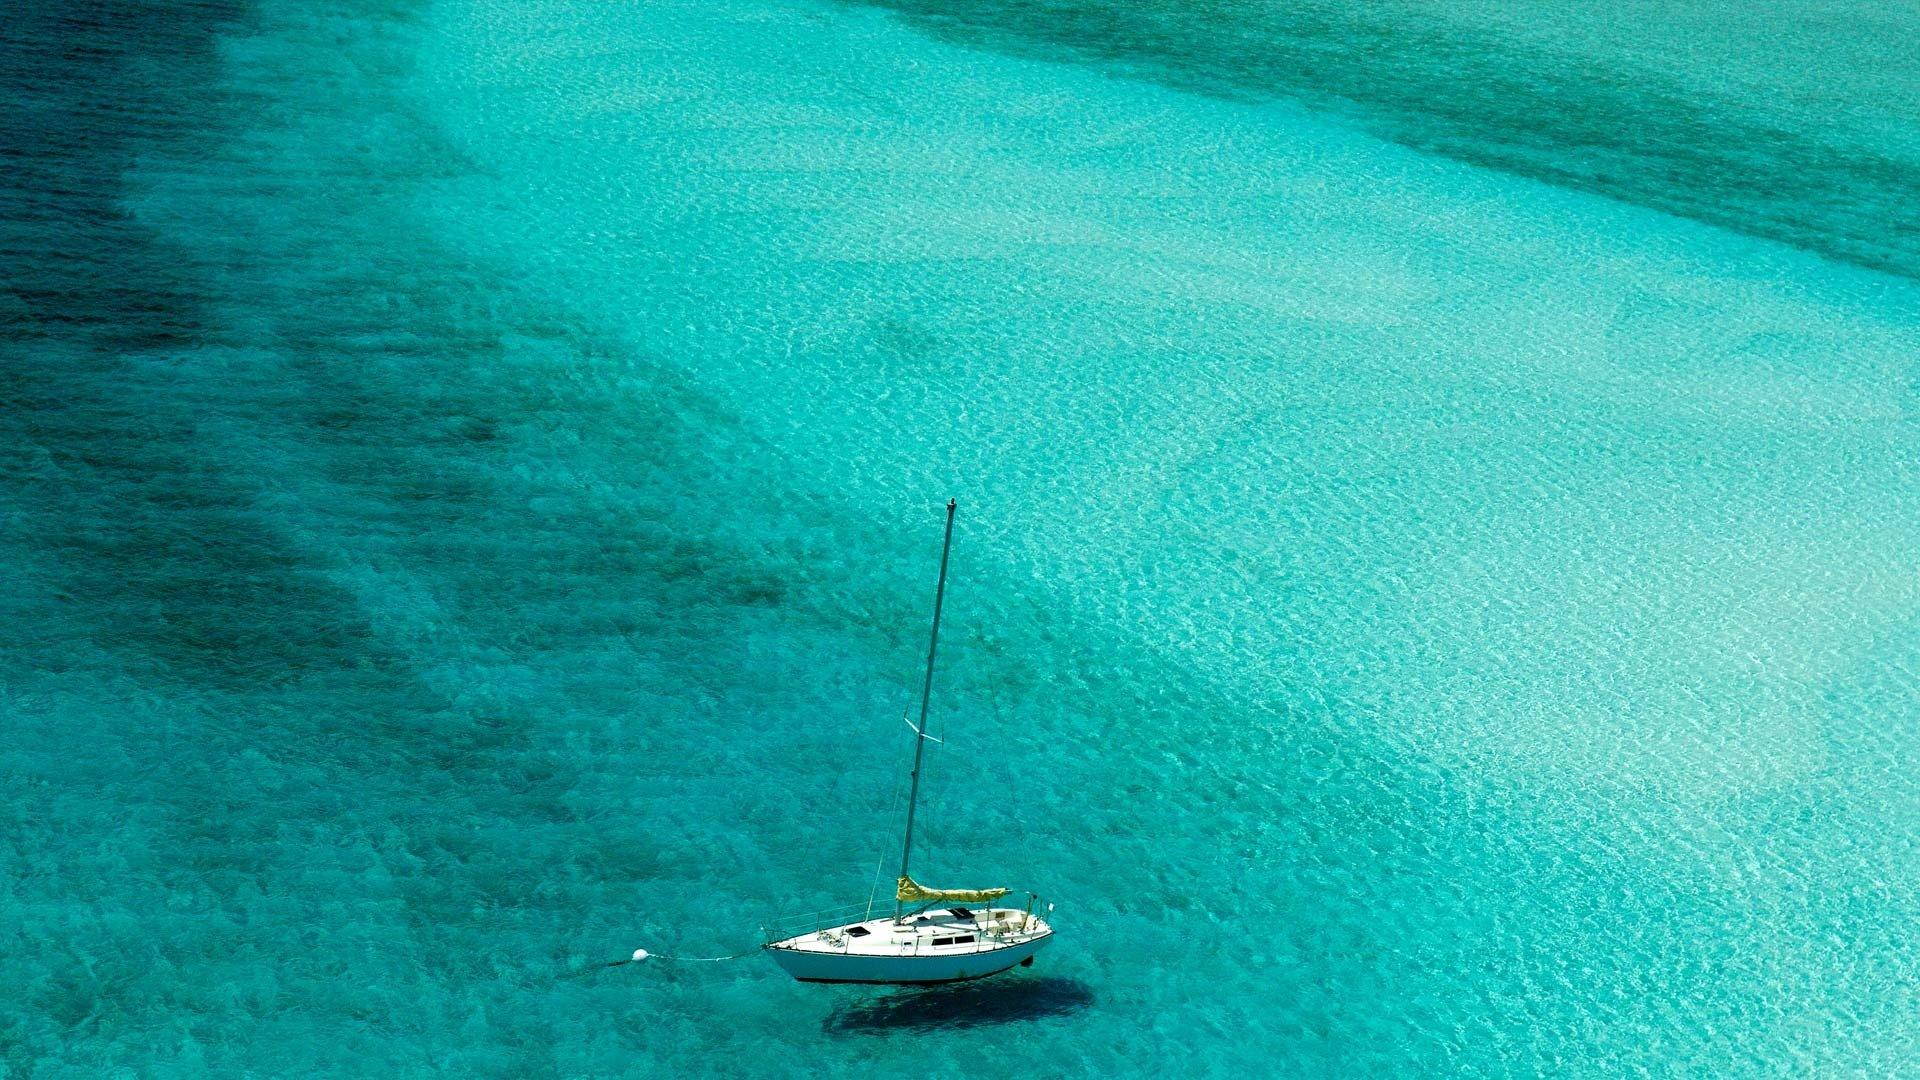 Bahamas_NorthAmerica_Itinerary2